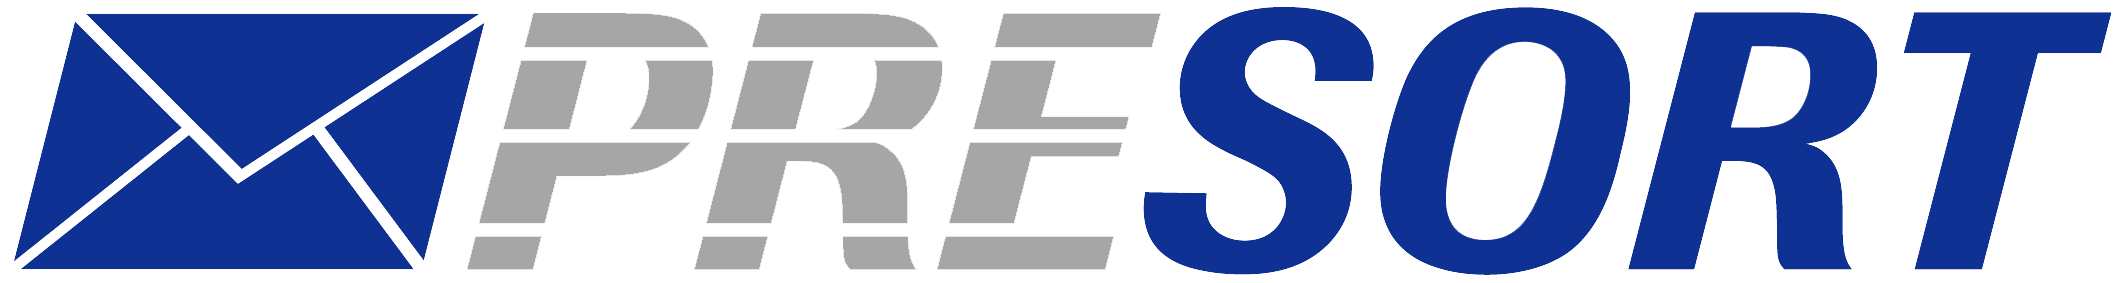 Presort eG Logo